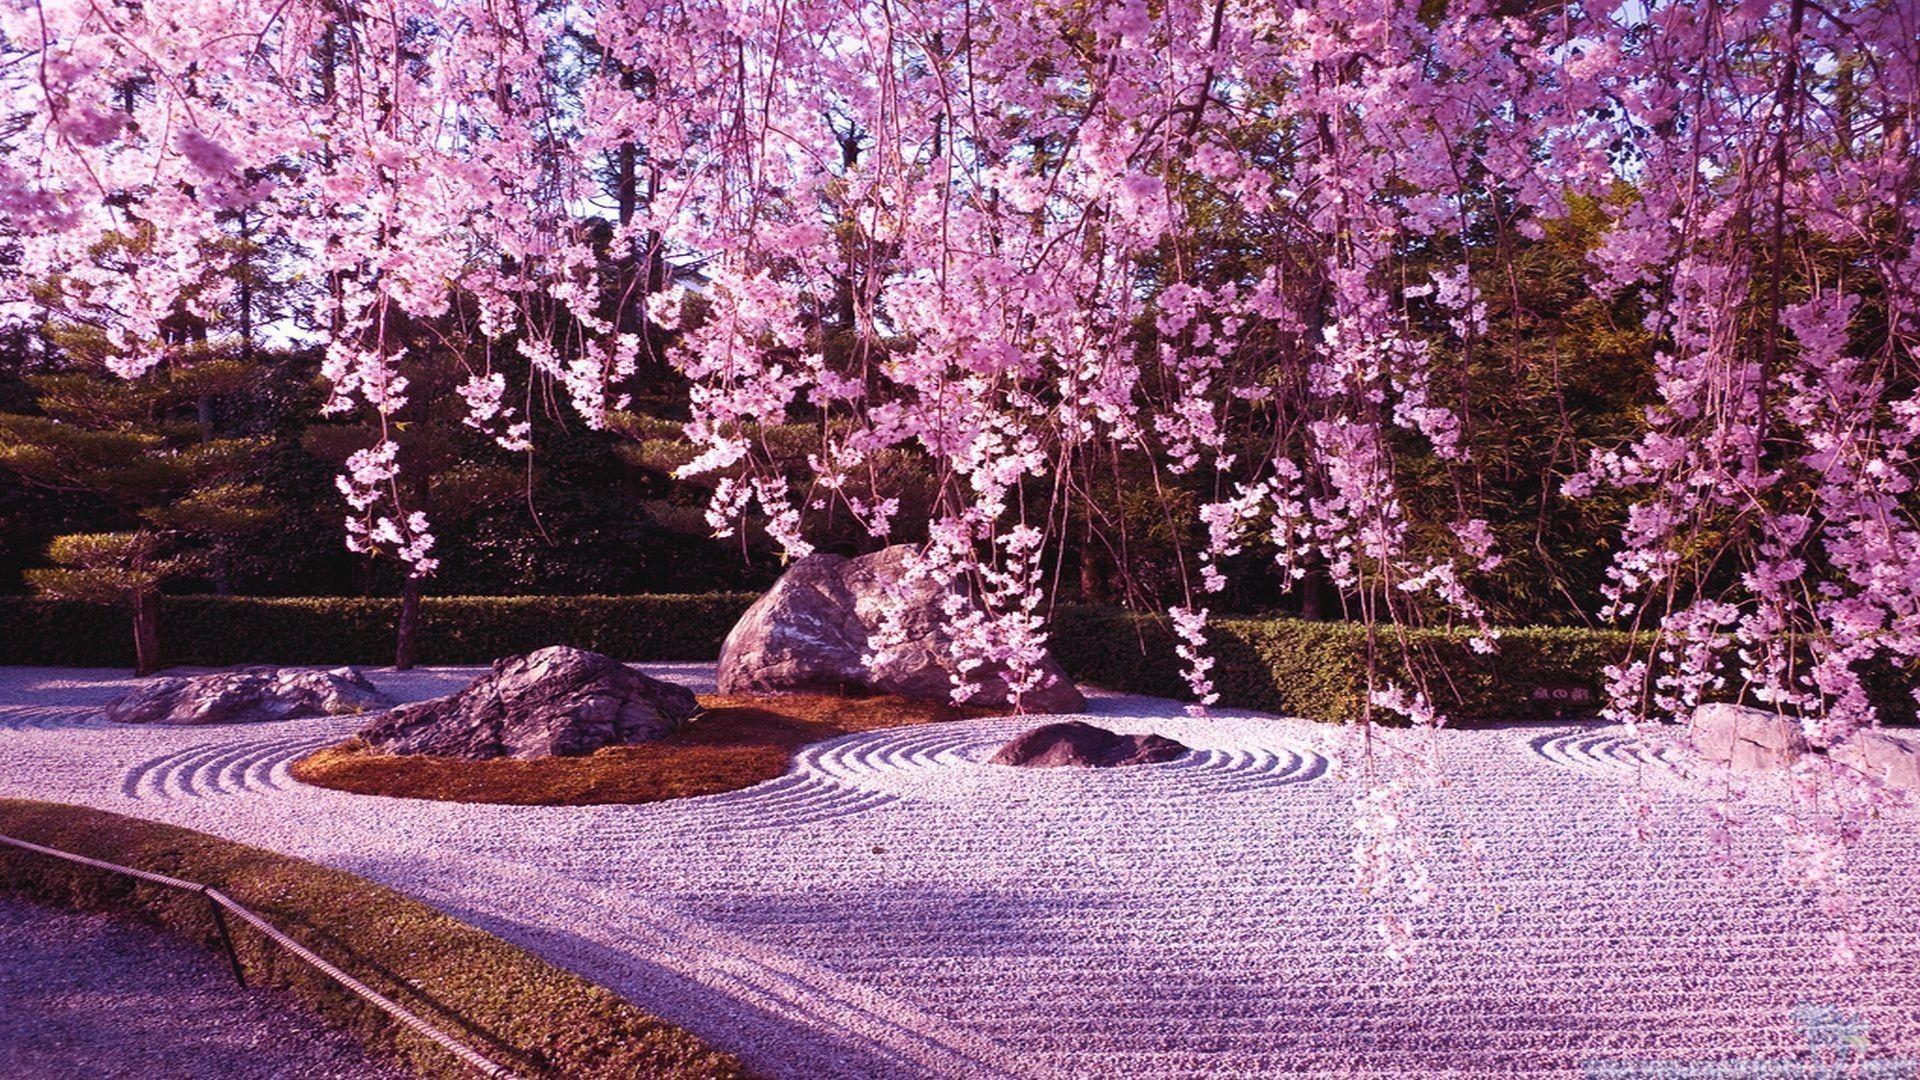 Res: 1920x1080, Cherry Blossom Tree Wallpaper 18